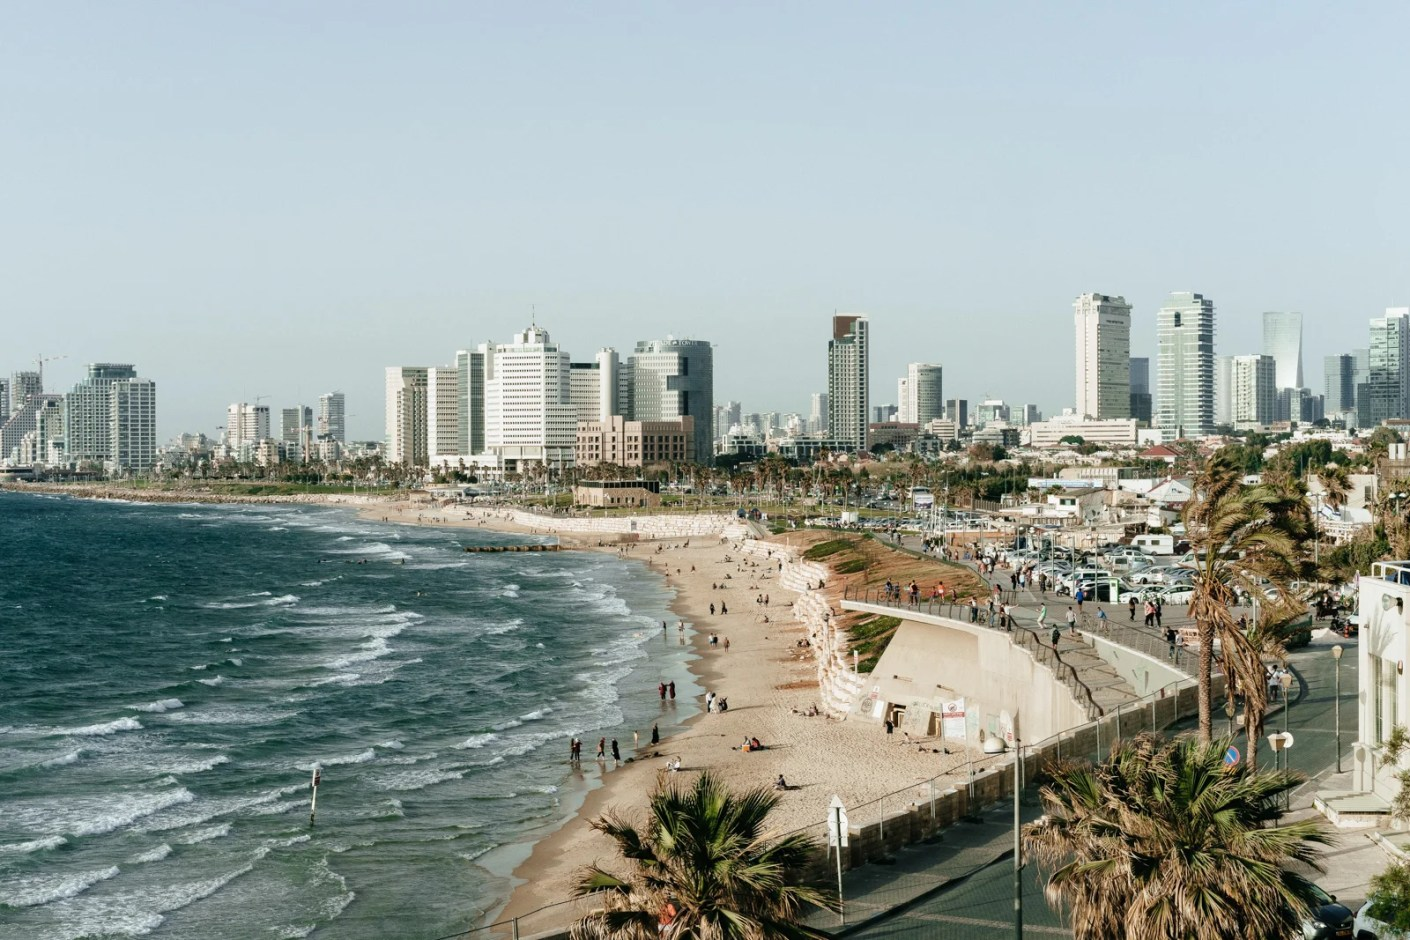 The city overlooks the beach in Tel Aviv-Yafo, Israel. (Photo by Adam Jang/Unsplash)